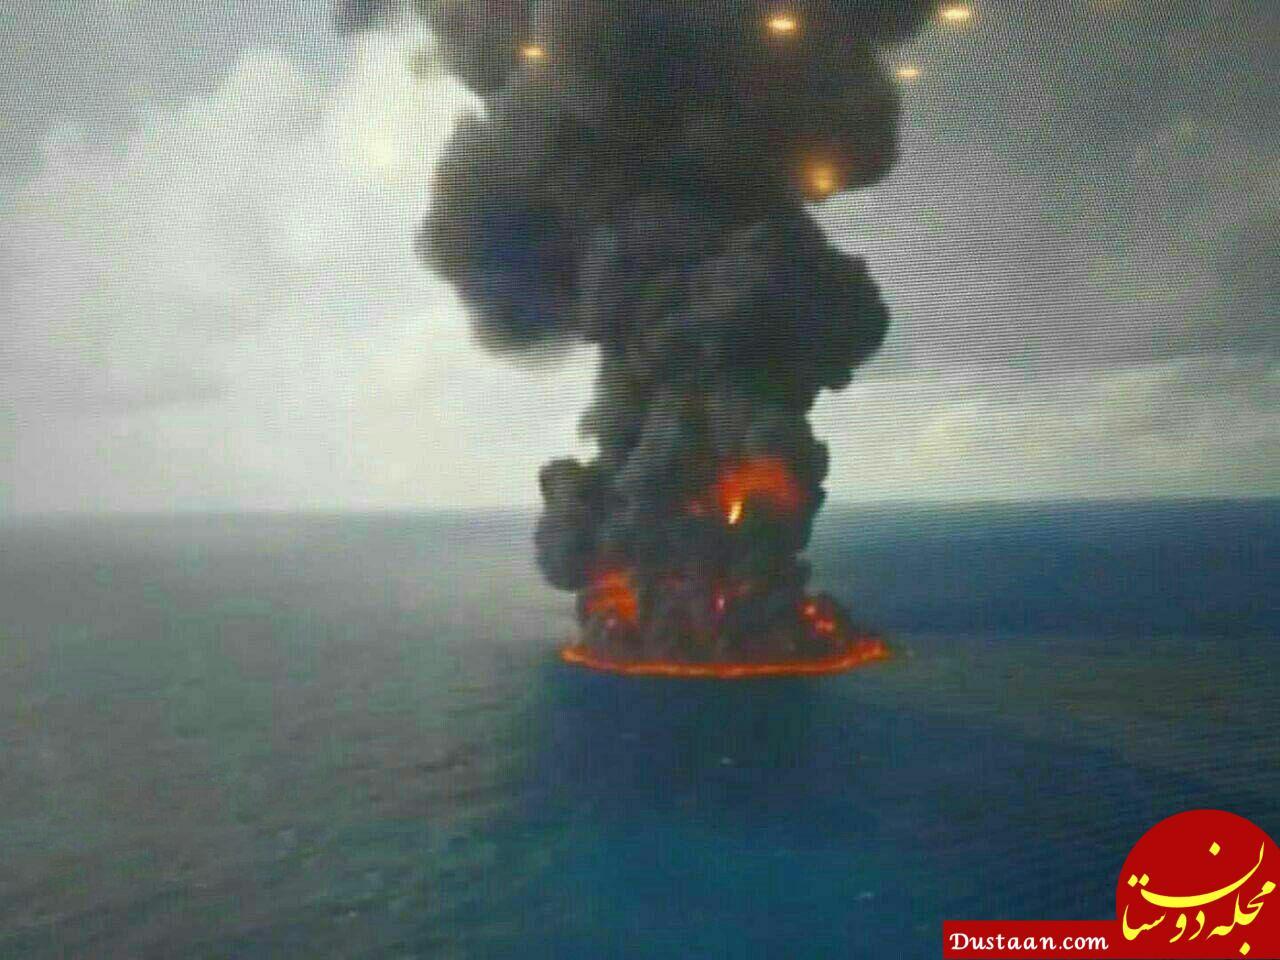 www.dustaan.com 32 خدمه نفتکش ایرانی در همان لحظات اولیه سانحه جان باختند